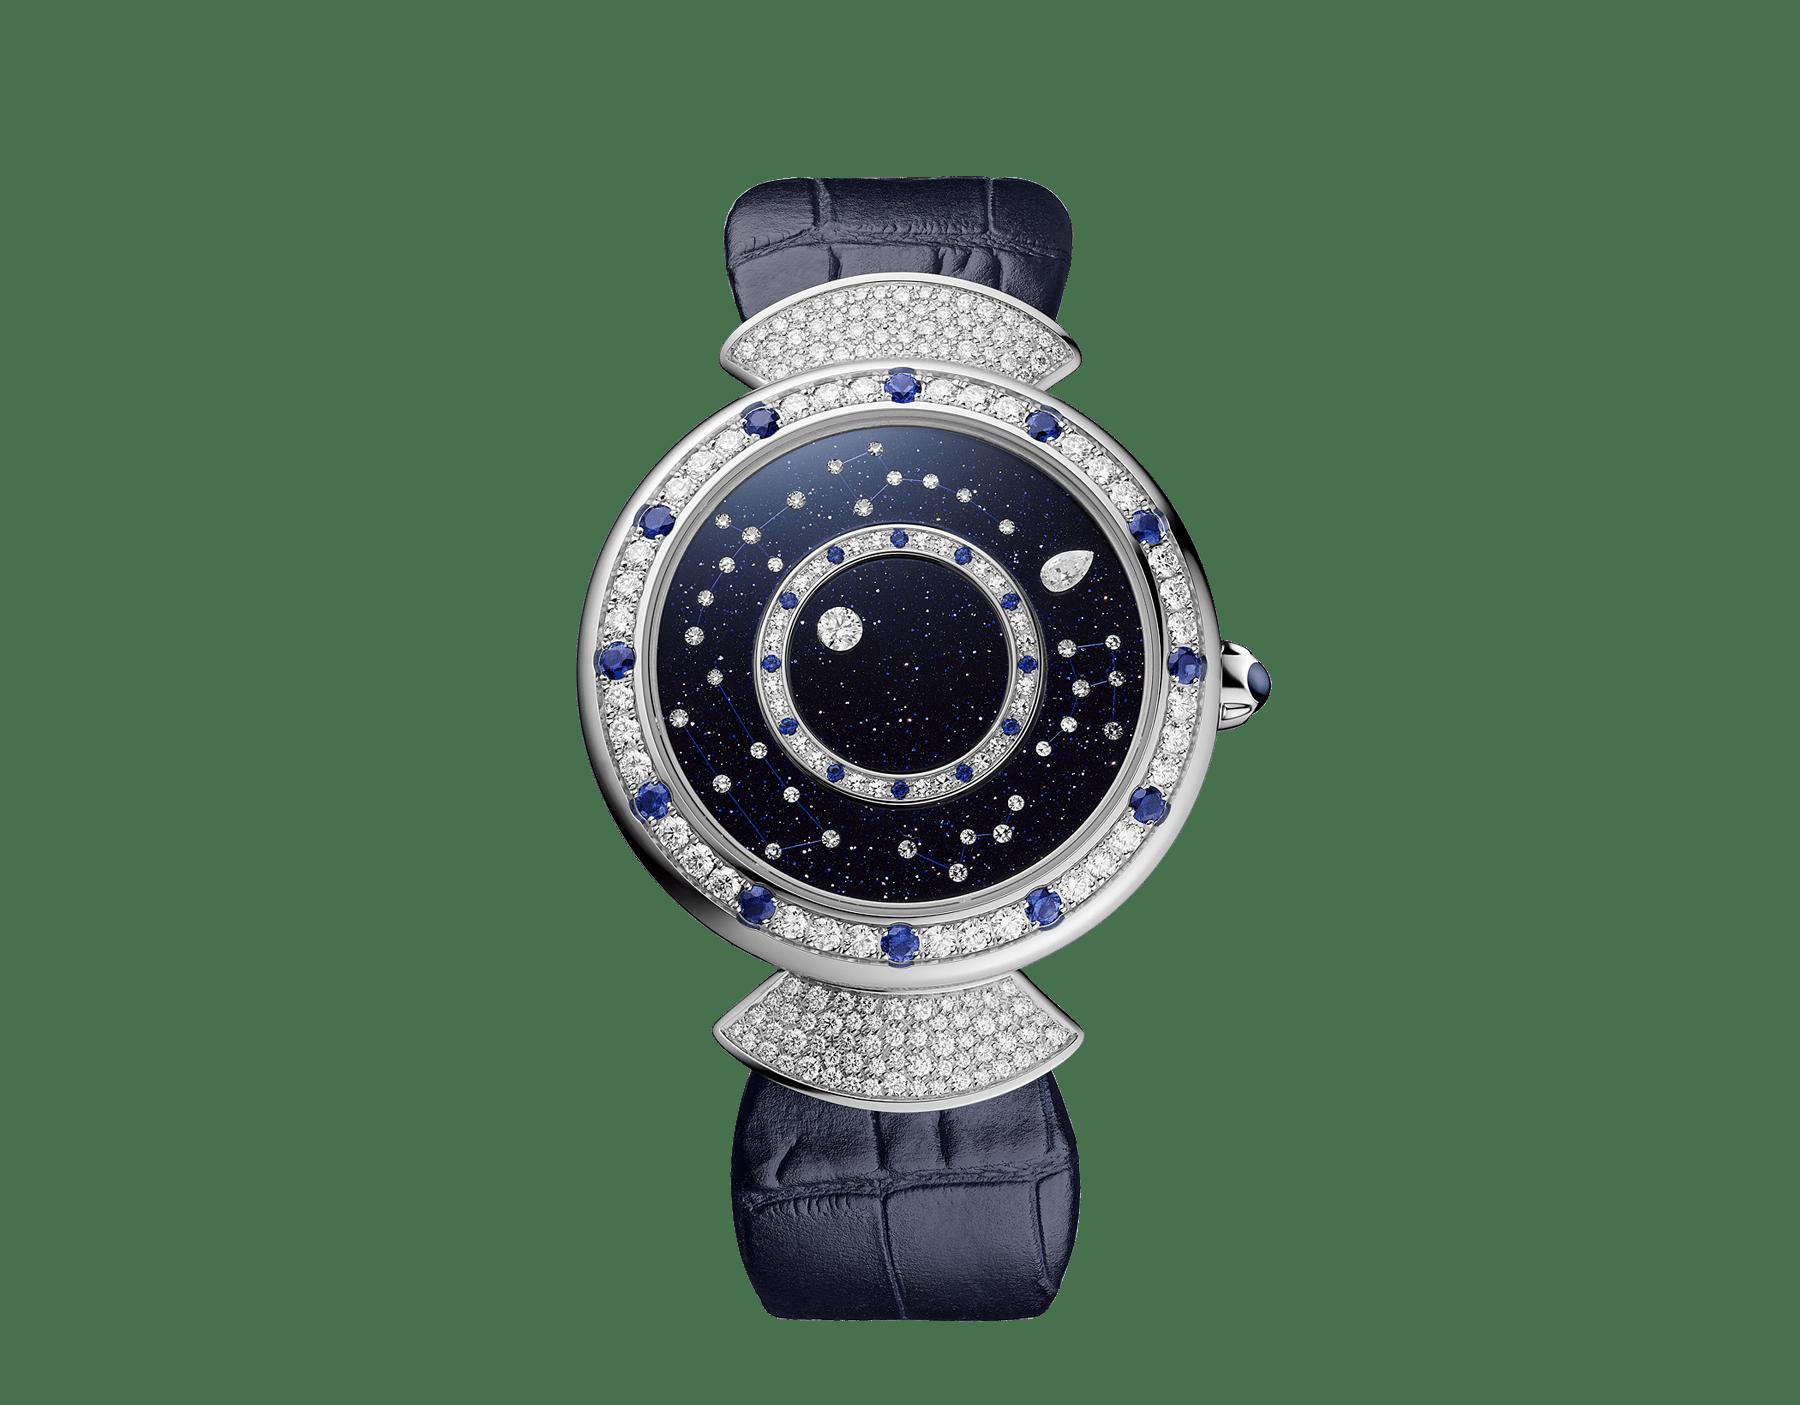 DIVAS' DREAM腕表,搭载品牌自制的自动上链机械机芯,18K白金表壳,镶嵌圆形明亮式切割钻石和蓝宝石,砂金石旋转表盘镶嵌钻石,并饰以星座图案,深蓝色鳄鱼皮表带 102842 image 1